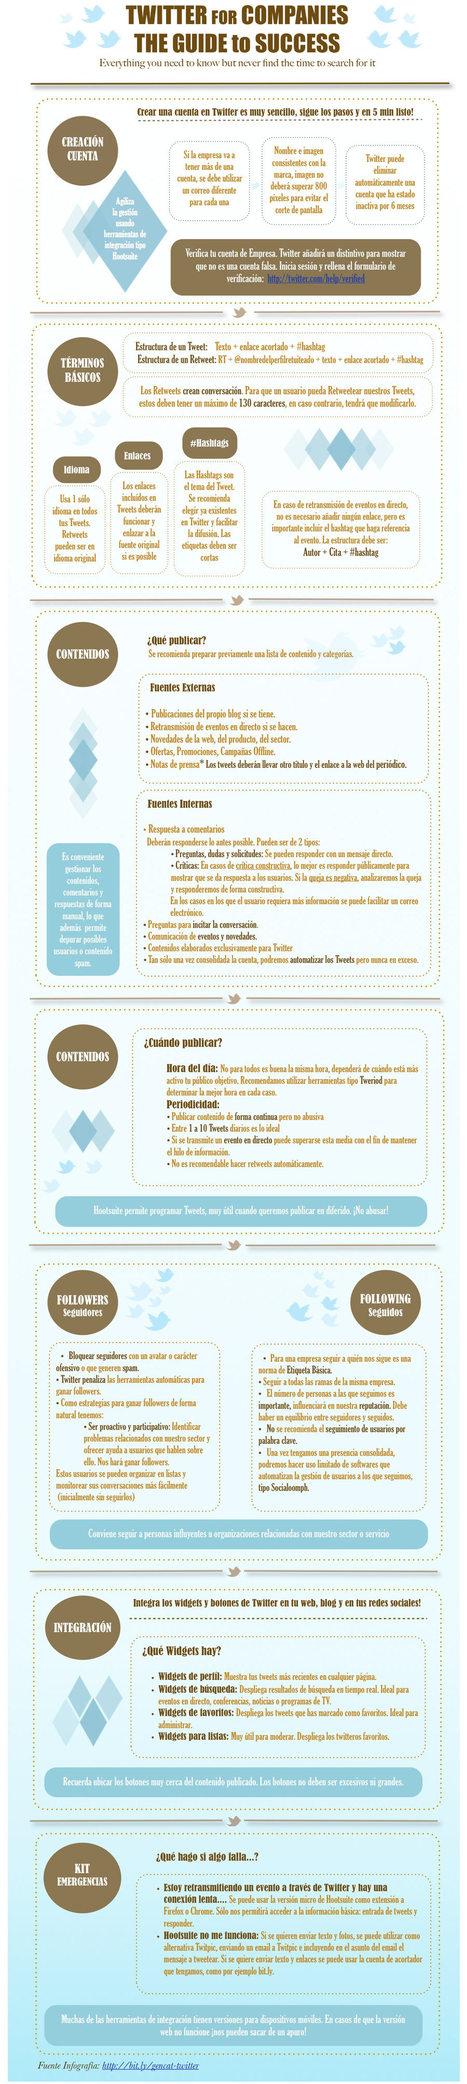 blogpocket » Blog Archive » Una infografía para aprender a utilizar Twitter | mi proyecto en twitter | Scoop.it